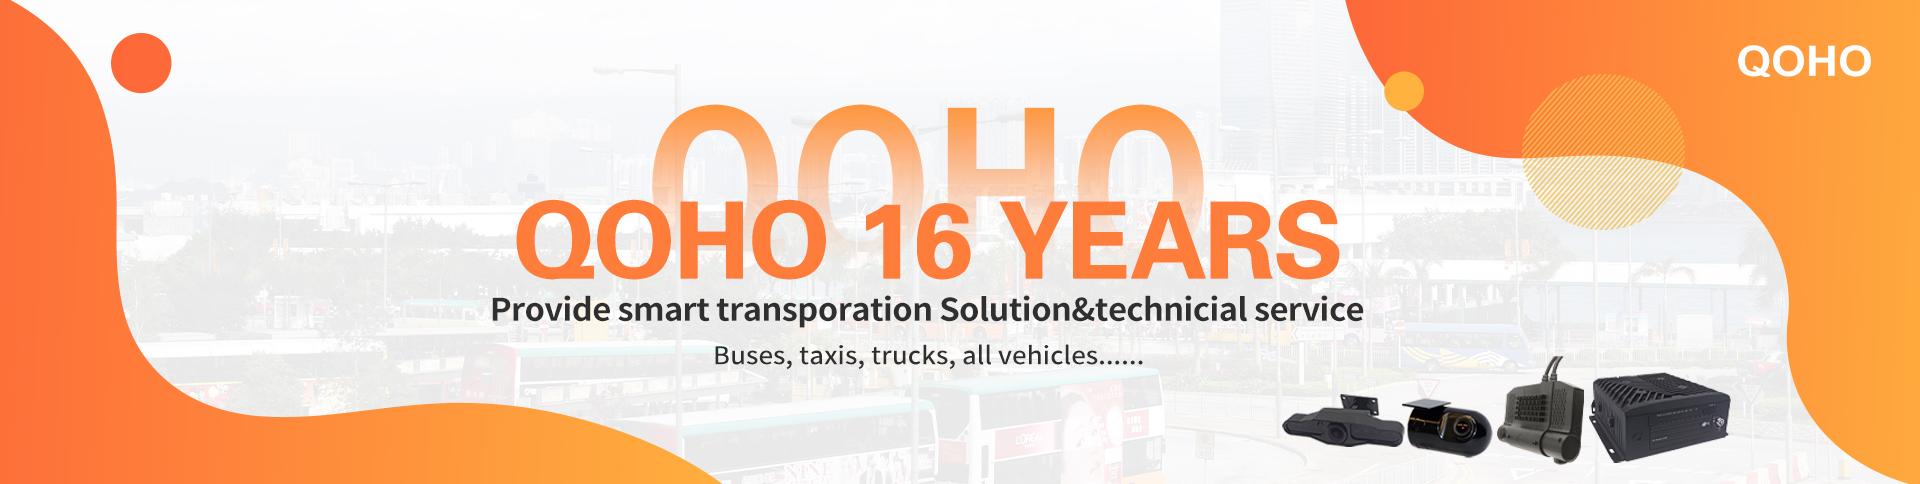 QOHO Mobile DVR manufacturer16 Years